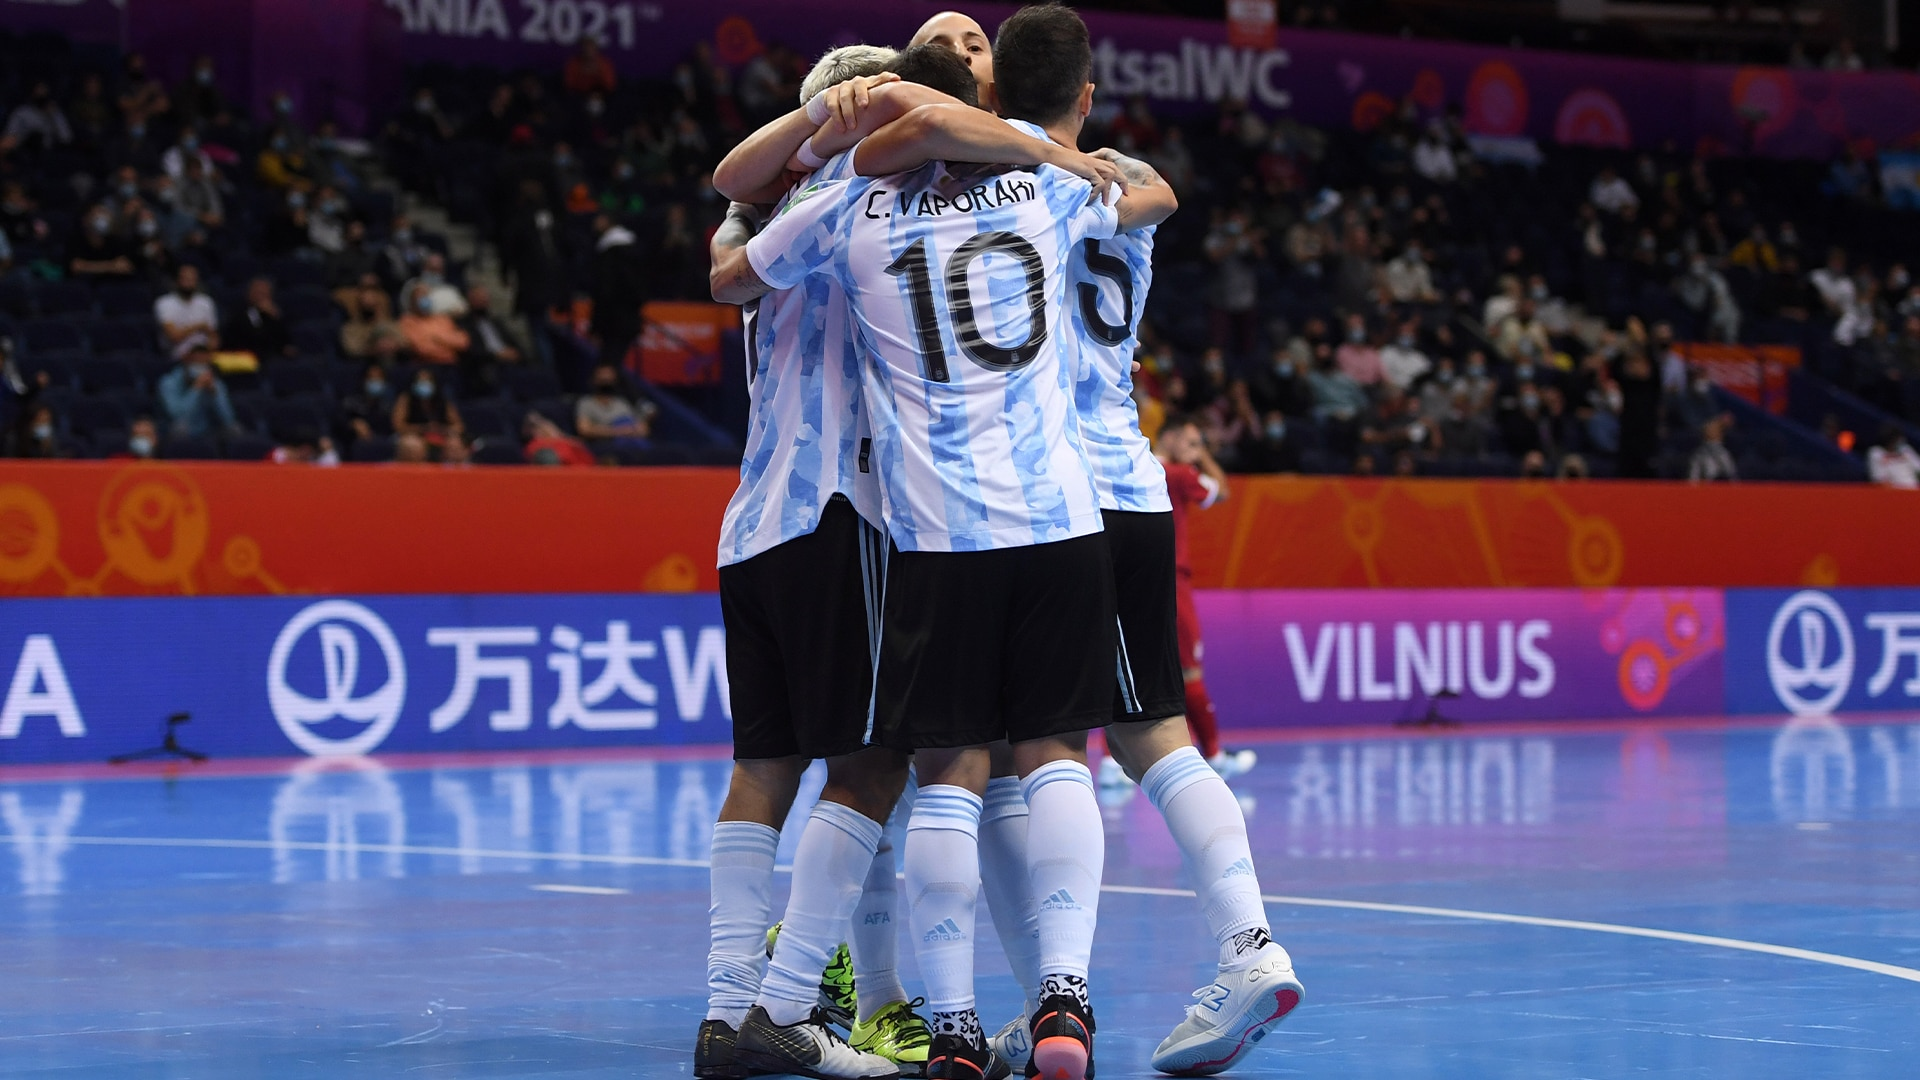 Watch FIFA Futsal World Cup Lithuania 2021 Highlight: Argentina vs. Serbia 4-2 - NBC.com